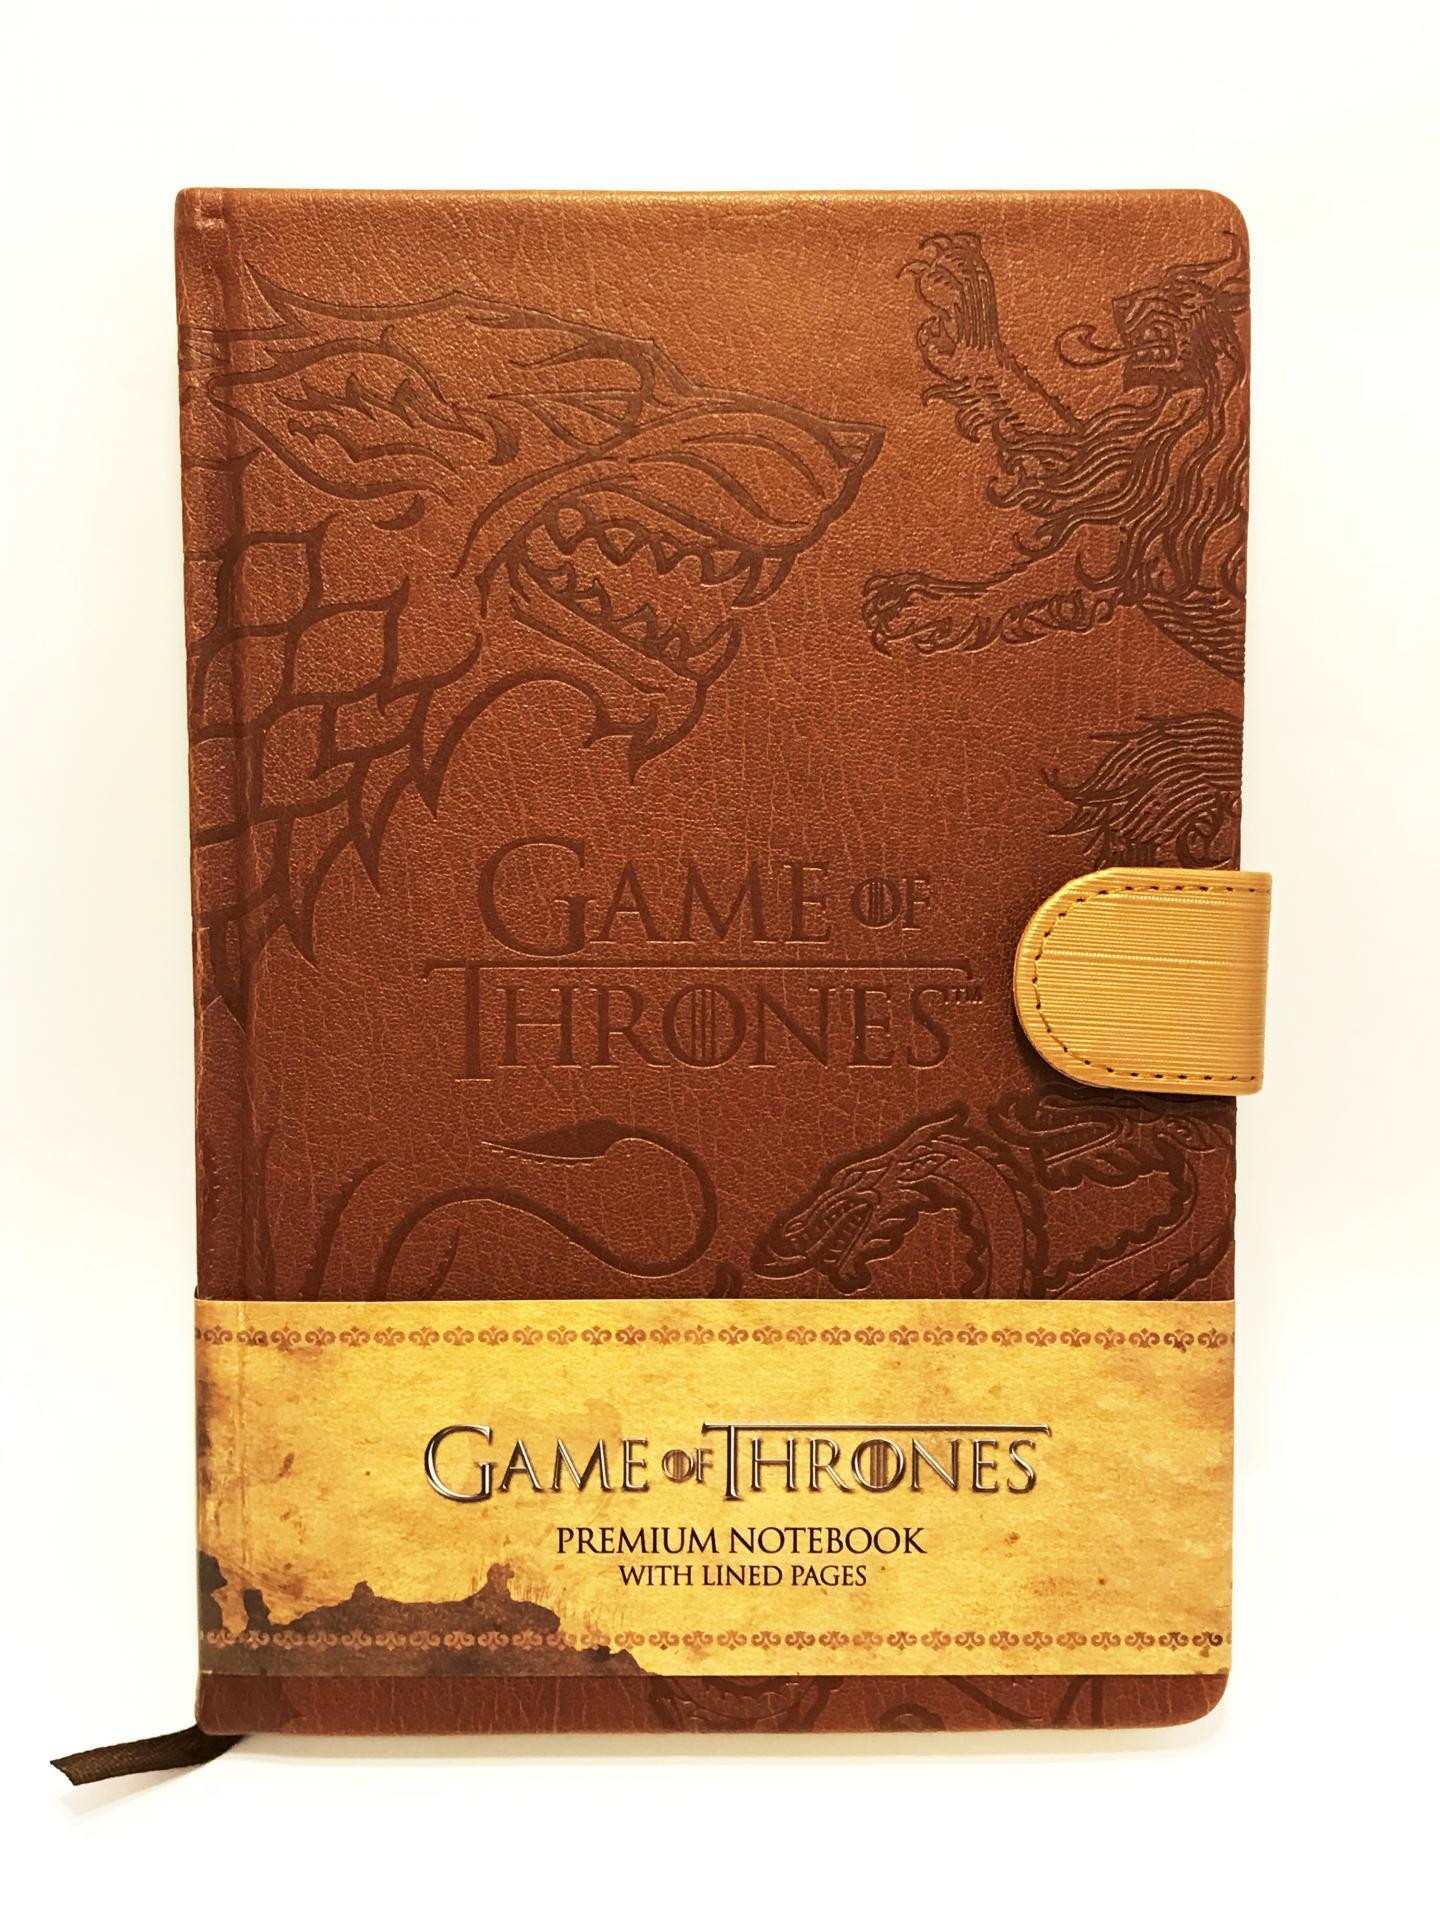 Game of thrones premium notebook a5